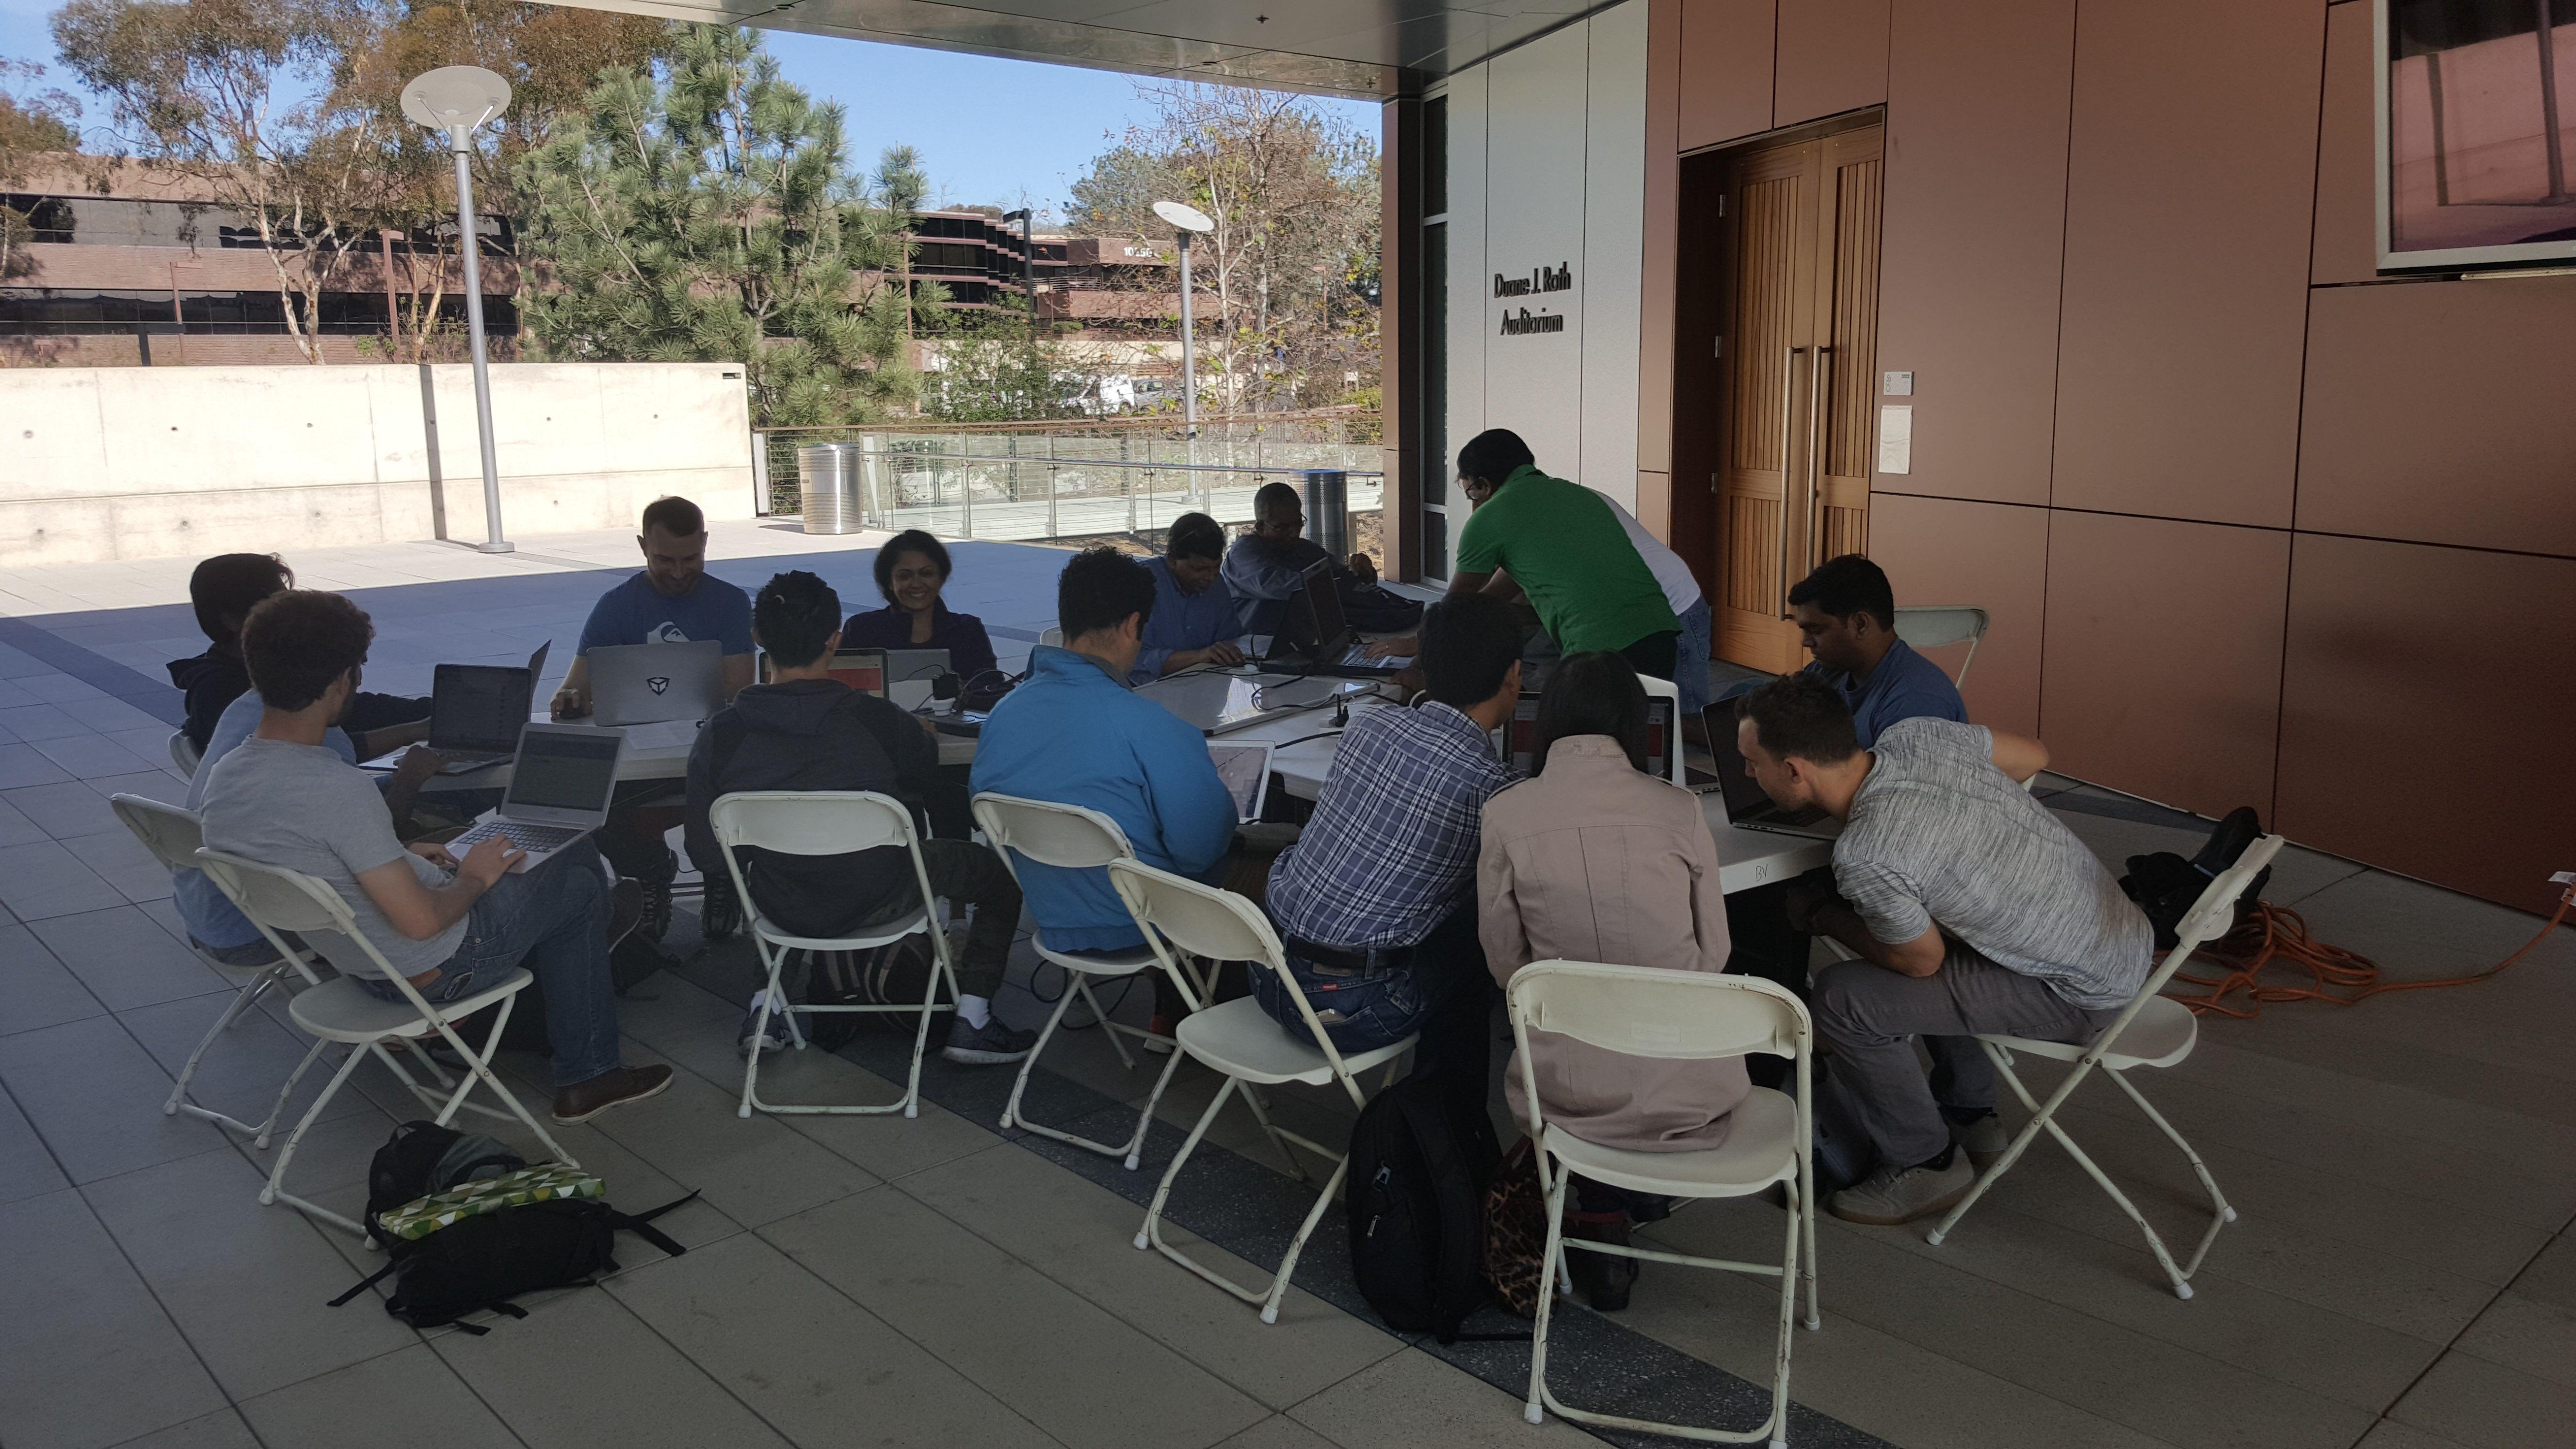 Photos - Machine Learning Society - San Diego Chapter (La Jolla, CA